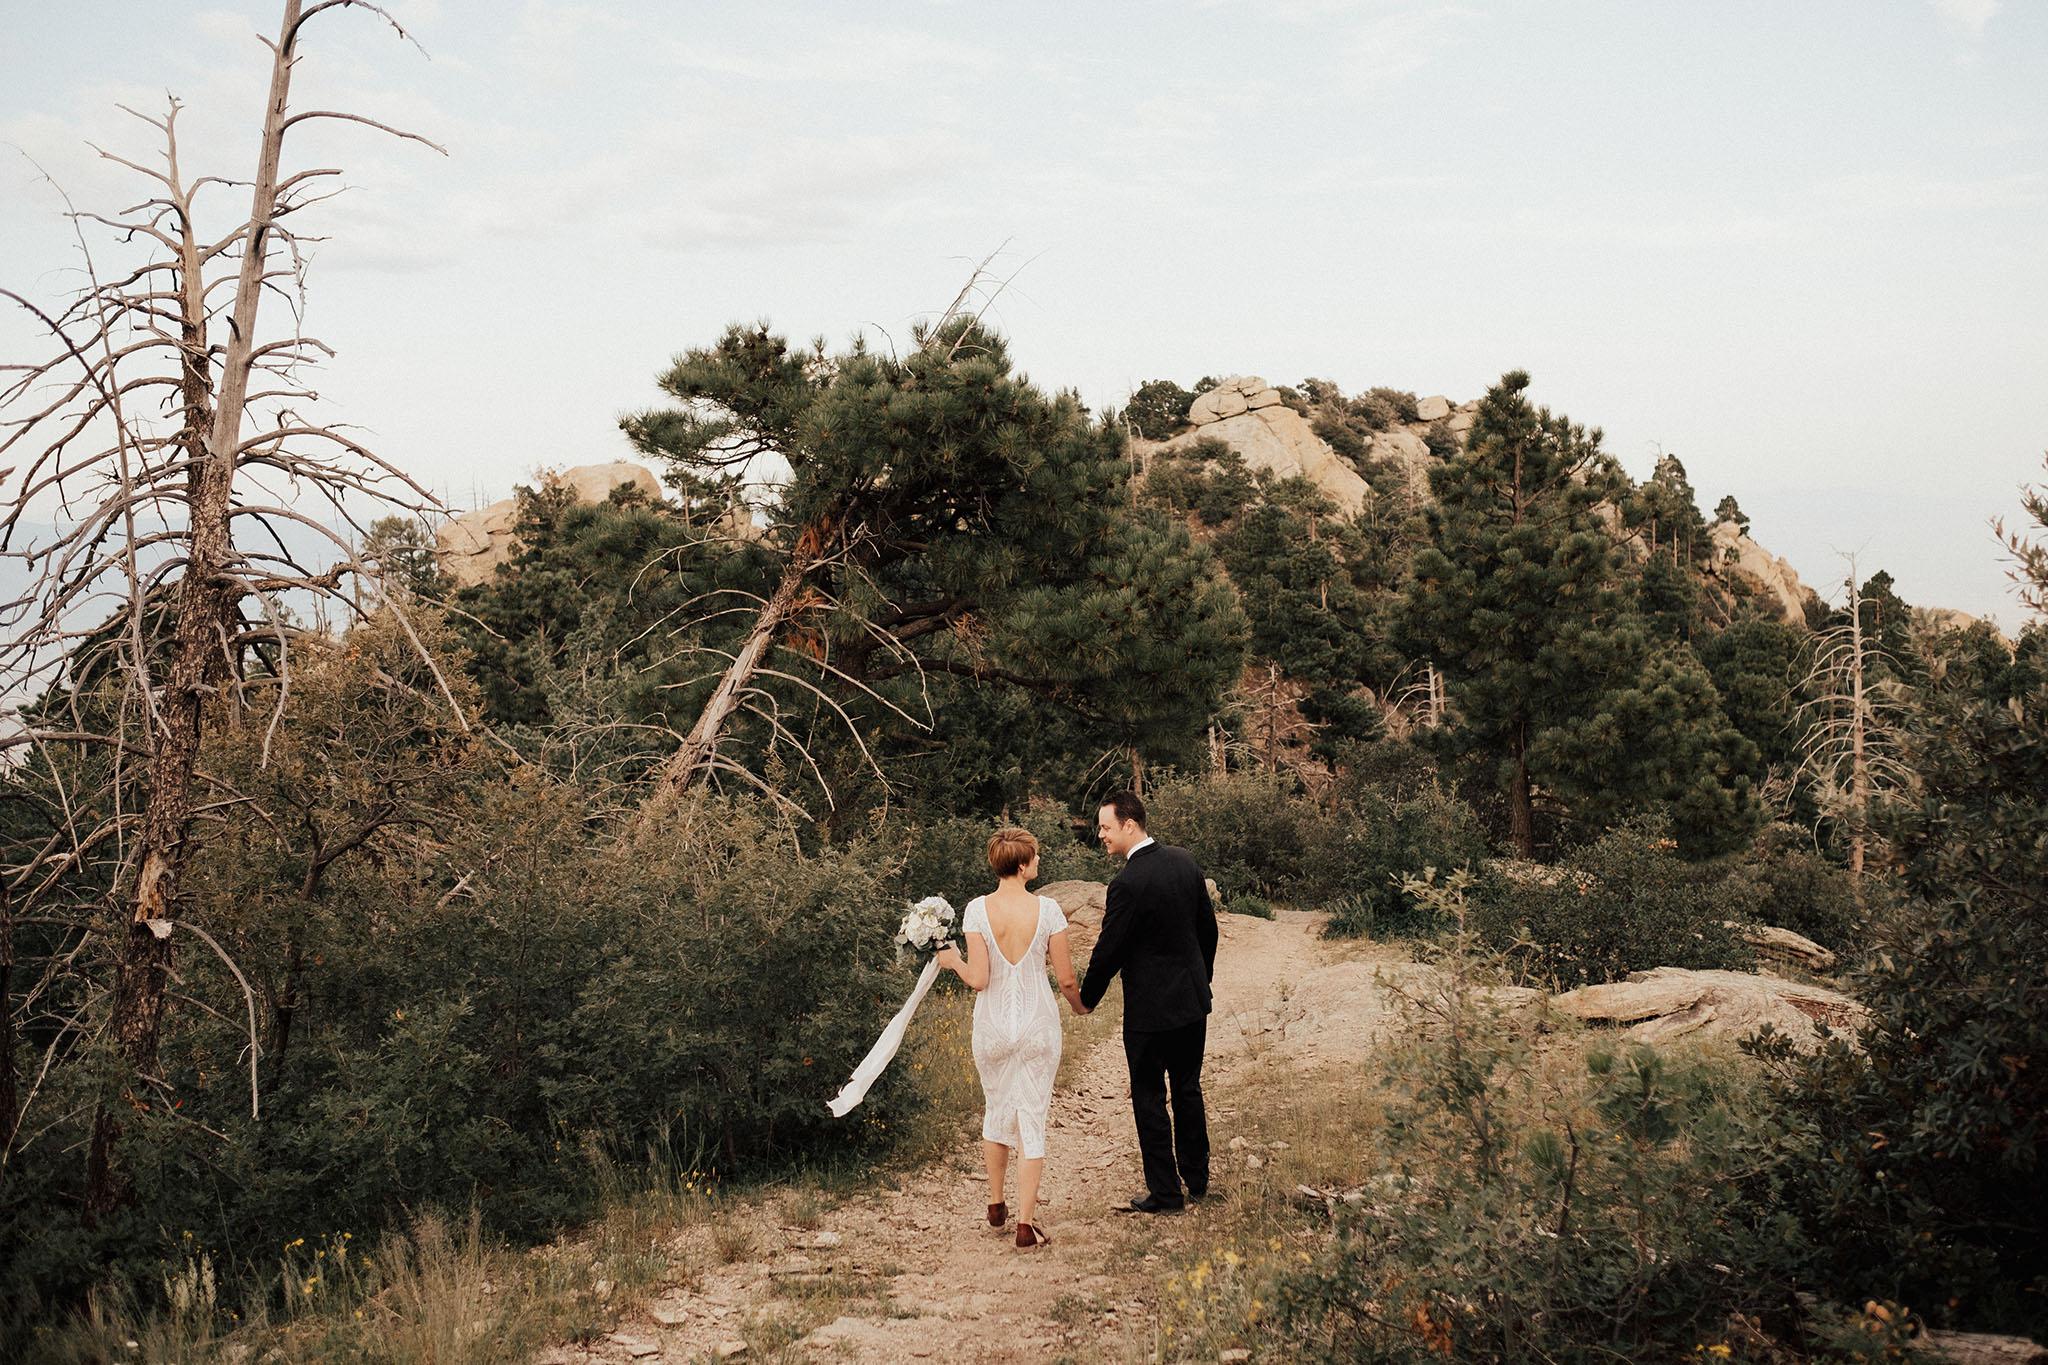 Arizona-Intimate-Elopement-Adventure-Photographer-Mount-Lemmon (13).jpg